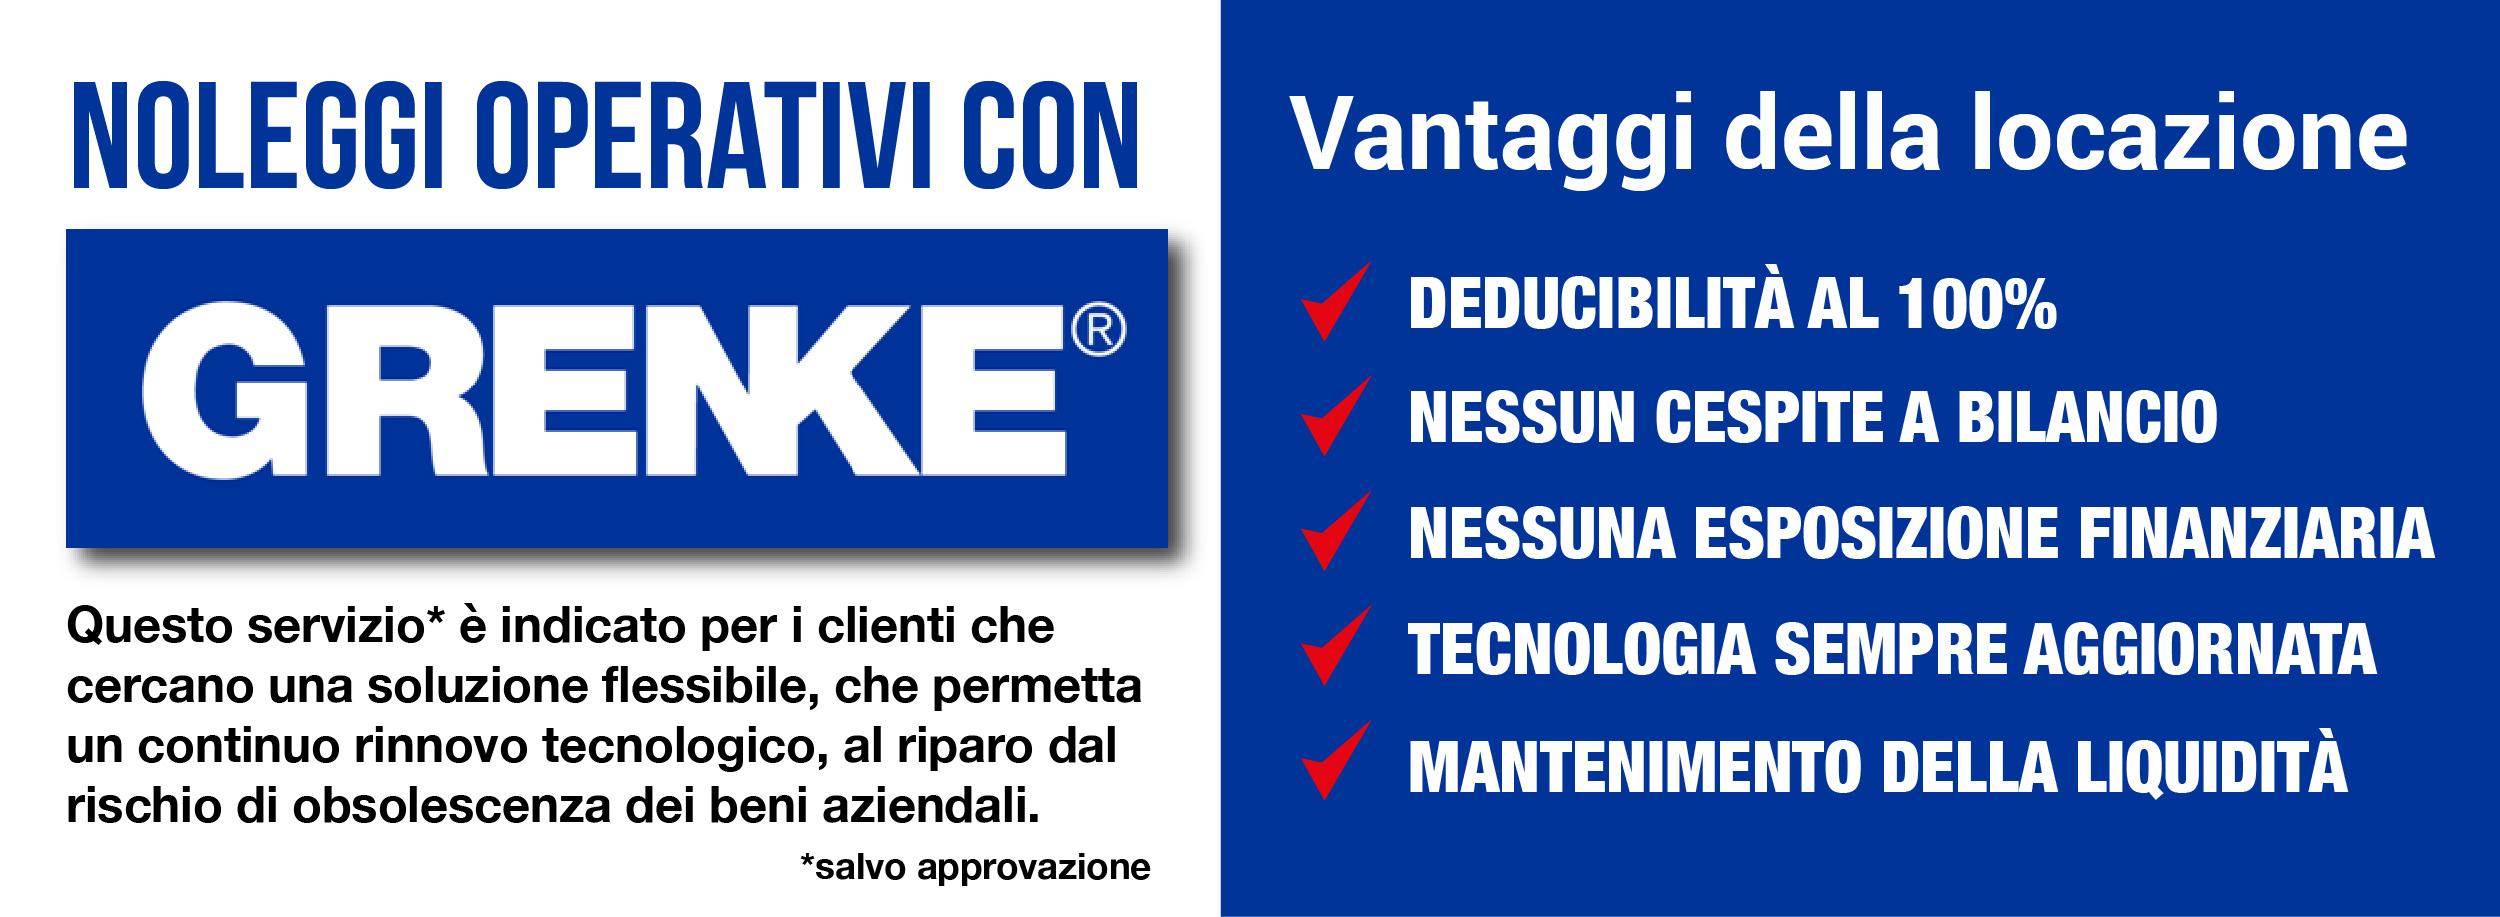 Noleggio_operativo_GRENKE